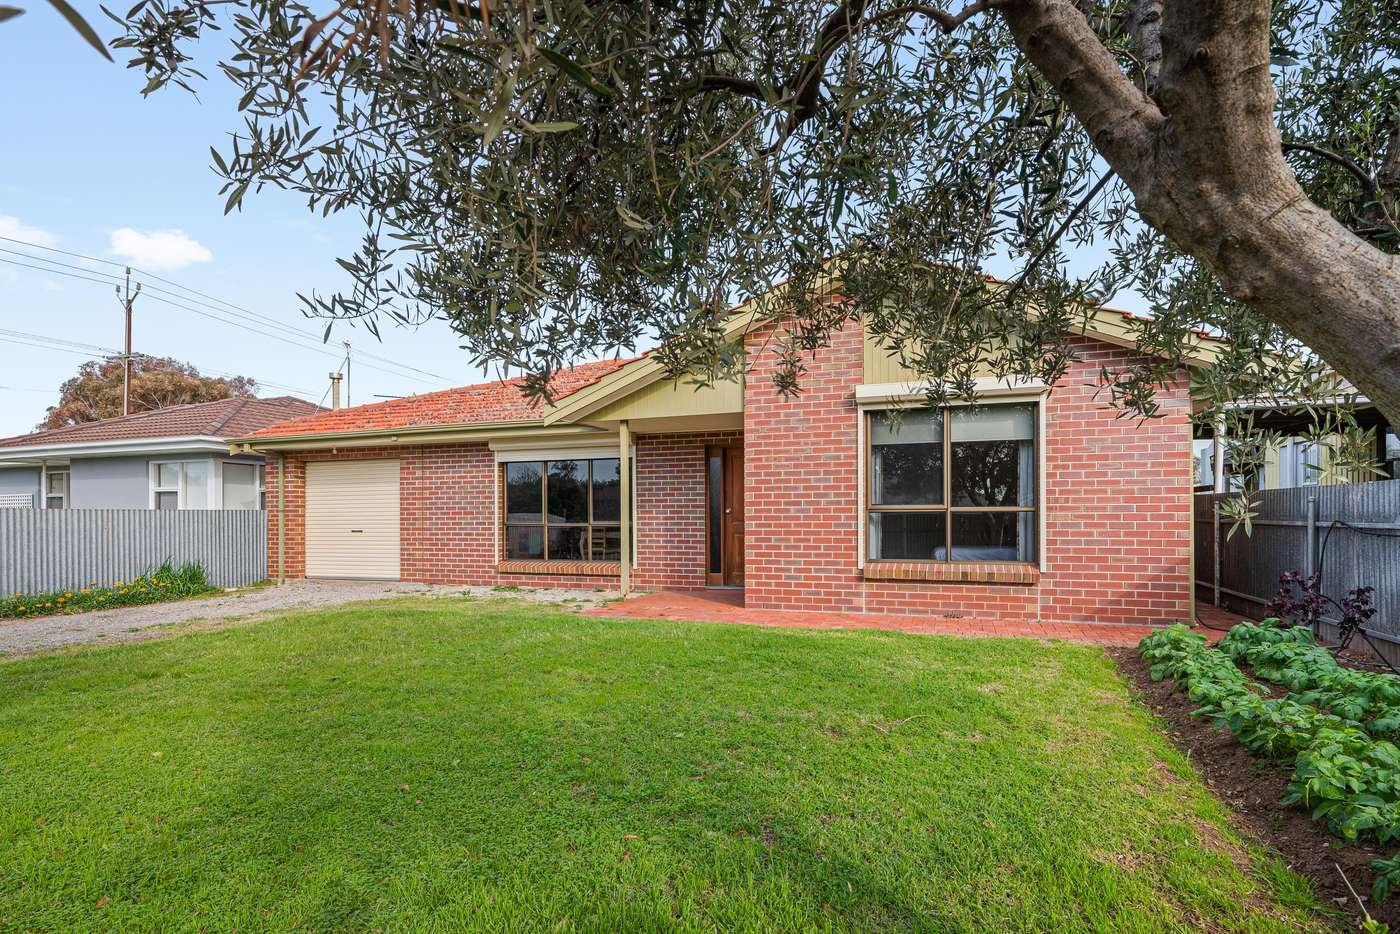 Main view of Homely house listing, 14 Seaview Street, Aldinga Beach SA 5173